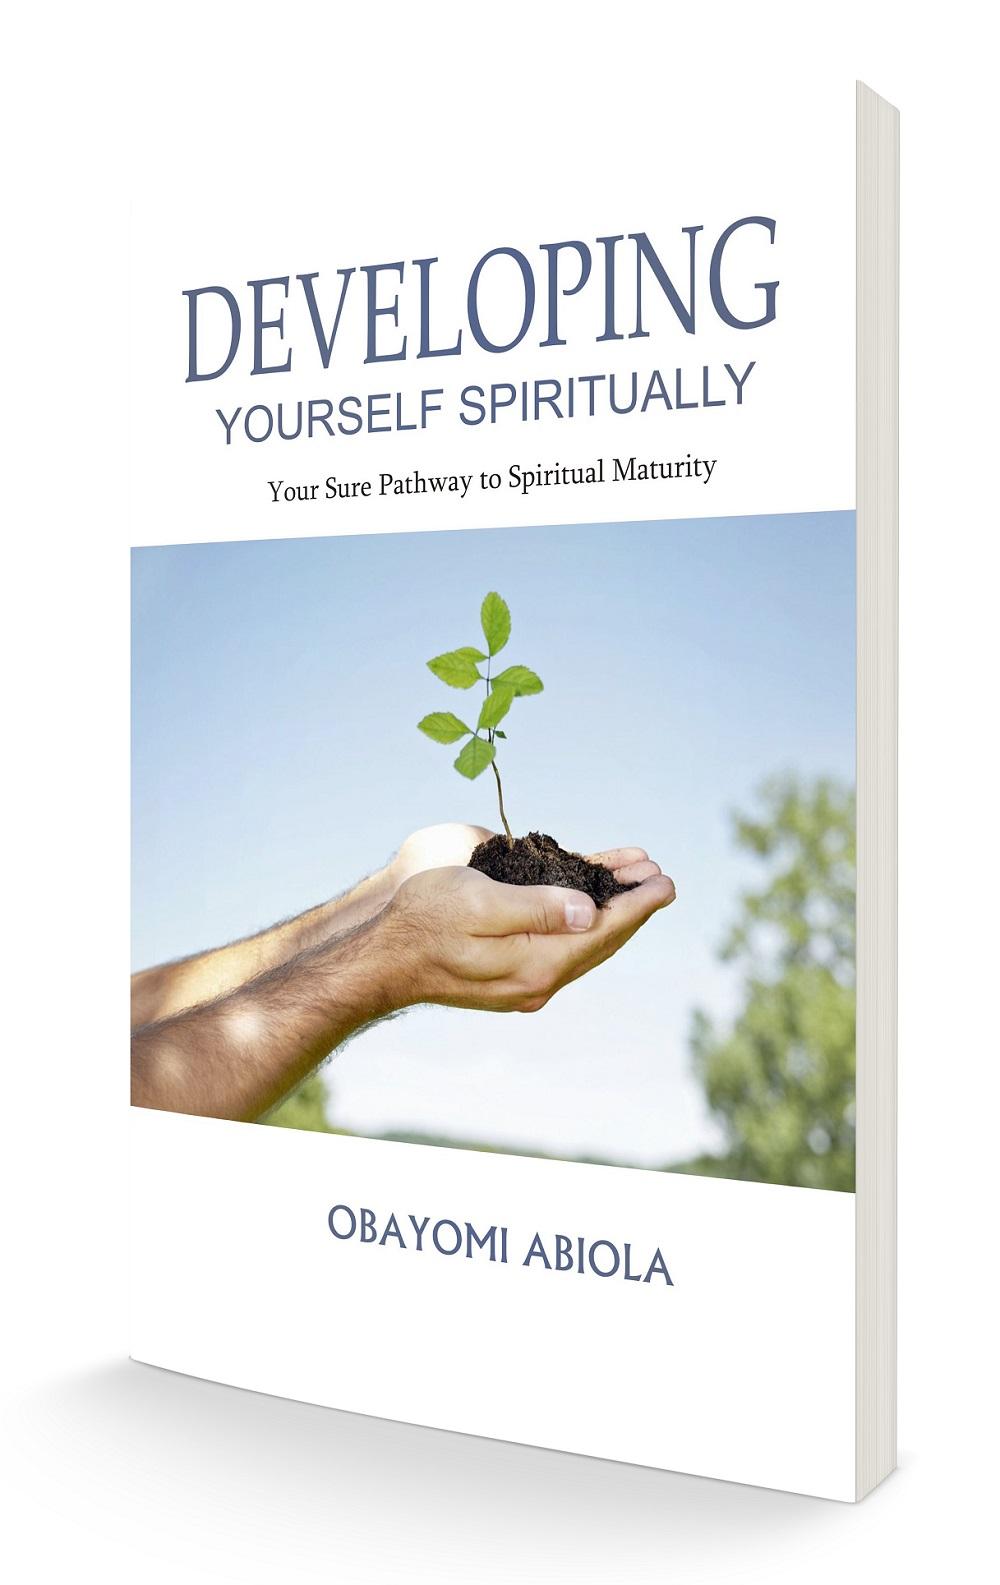 DEVELOPING YOURSELF SPIRITUALLY: YOUR SURE PATHWAY TO SPIRITUAL MATURITY